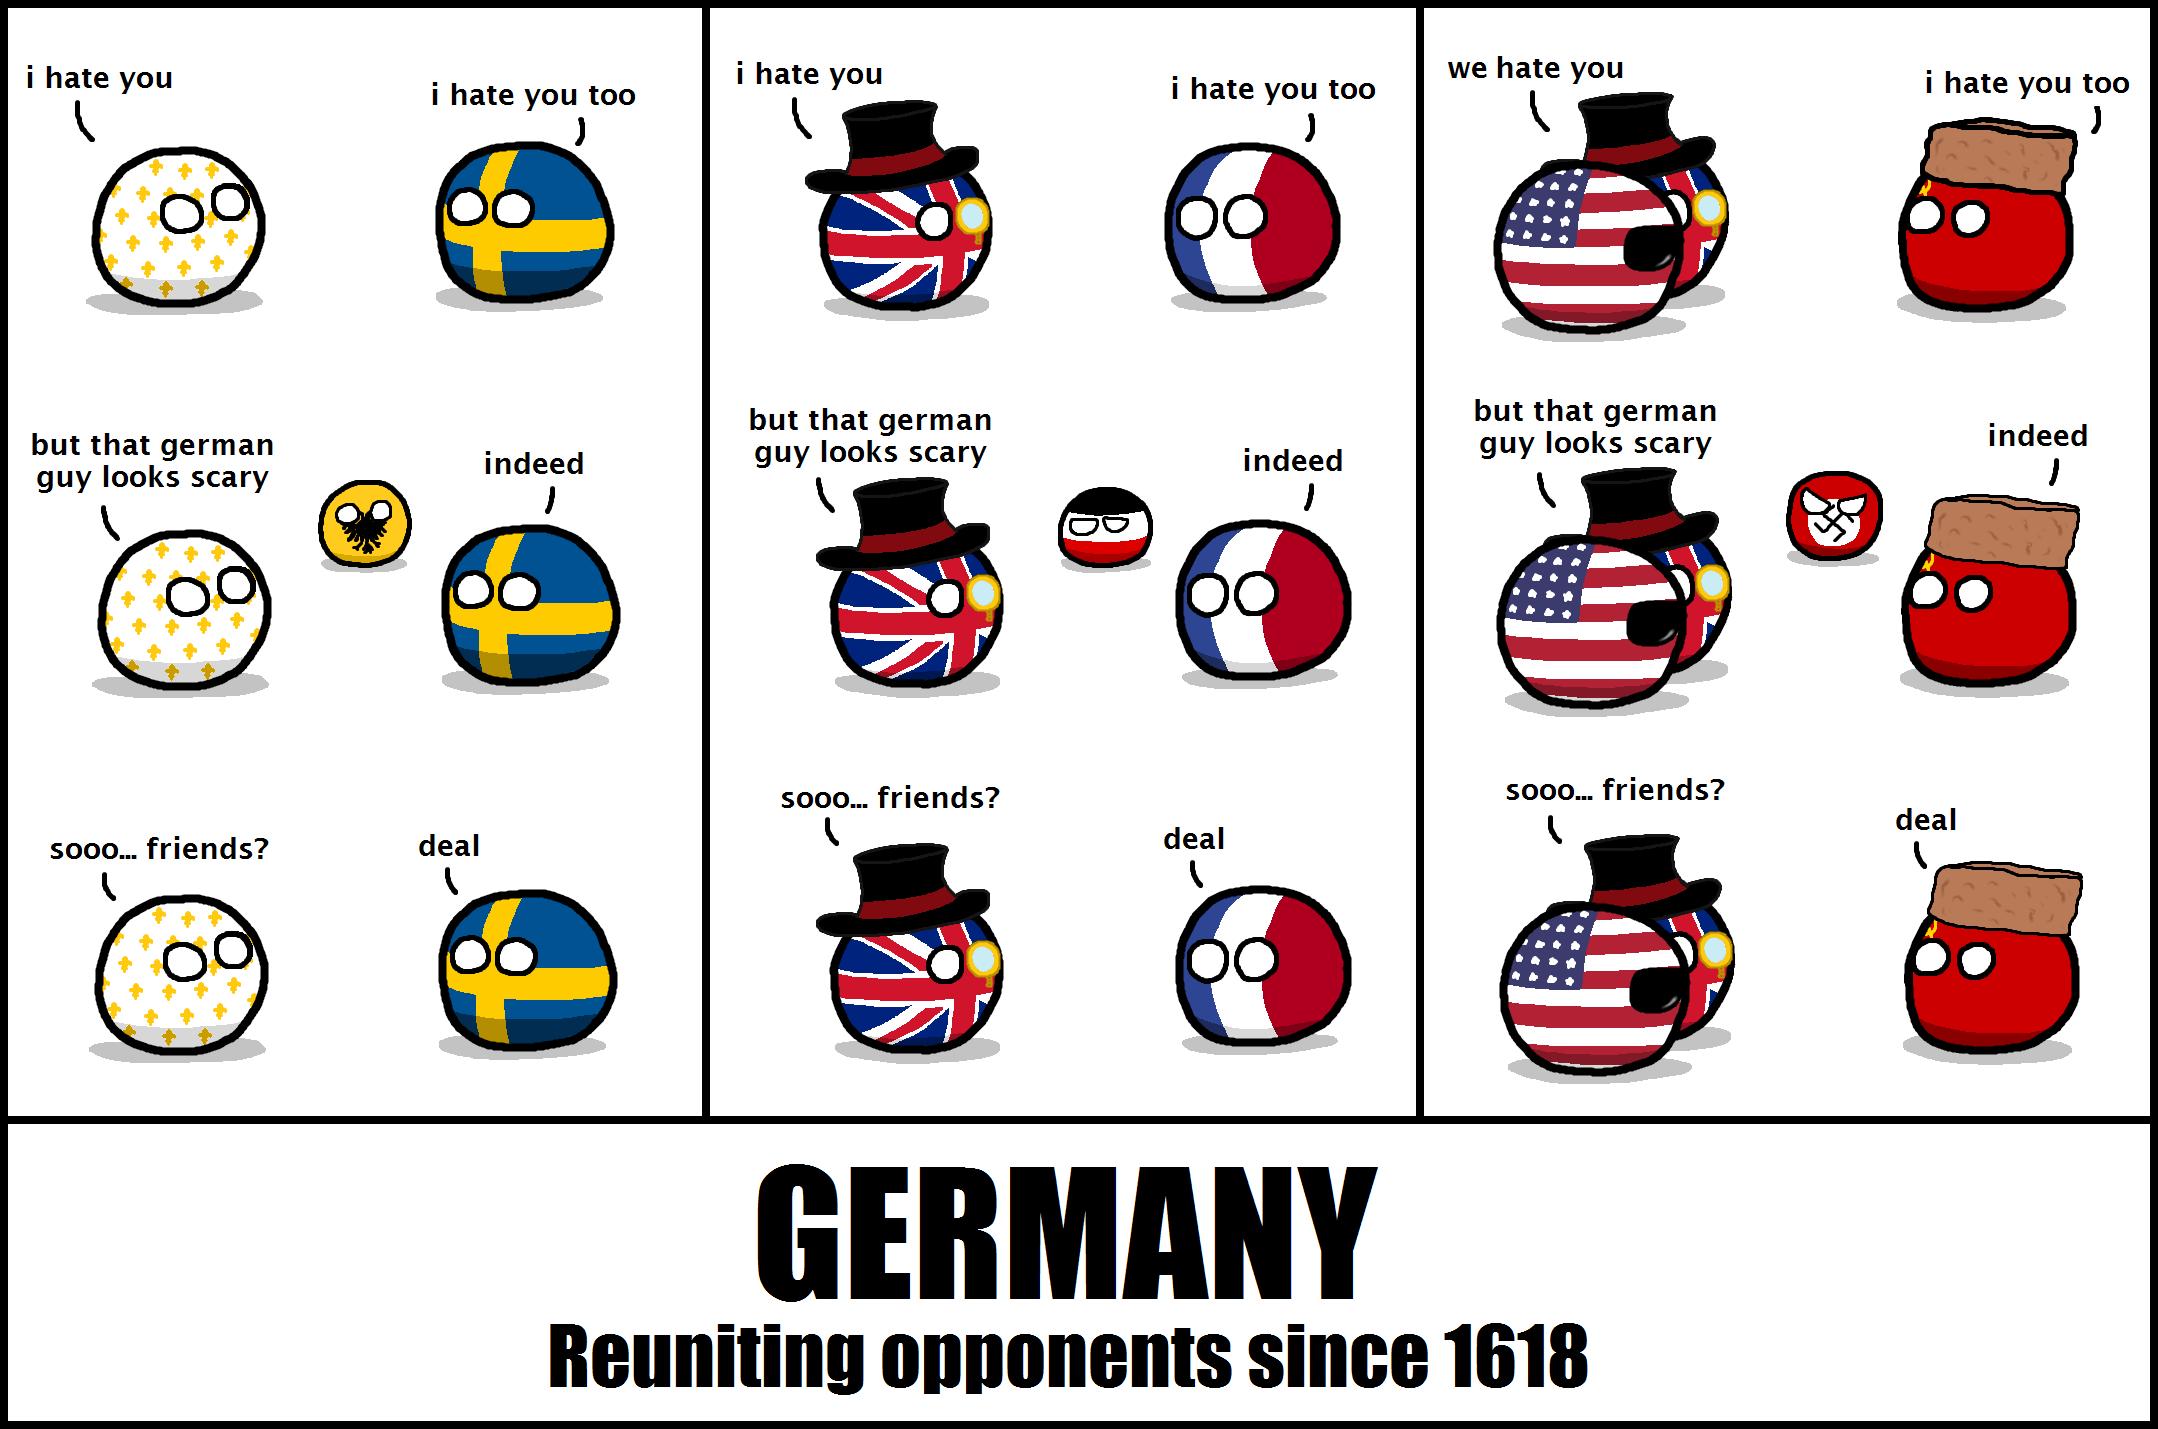 Germany is.... r/polandball (Cerf) reddit.com/r/polandball/comments/1xzl1o/germanyreunitingopponentssince_1618/. i hate you i hate you we hate you i hate you to Polandball germany 2spooky4me